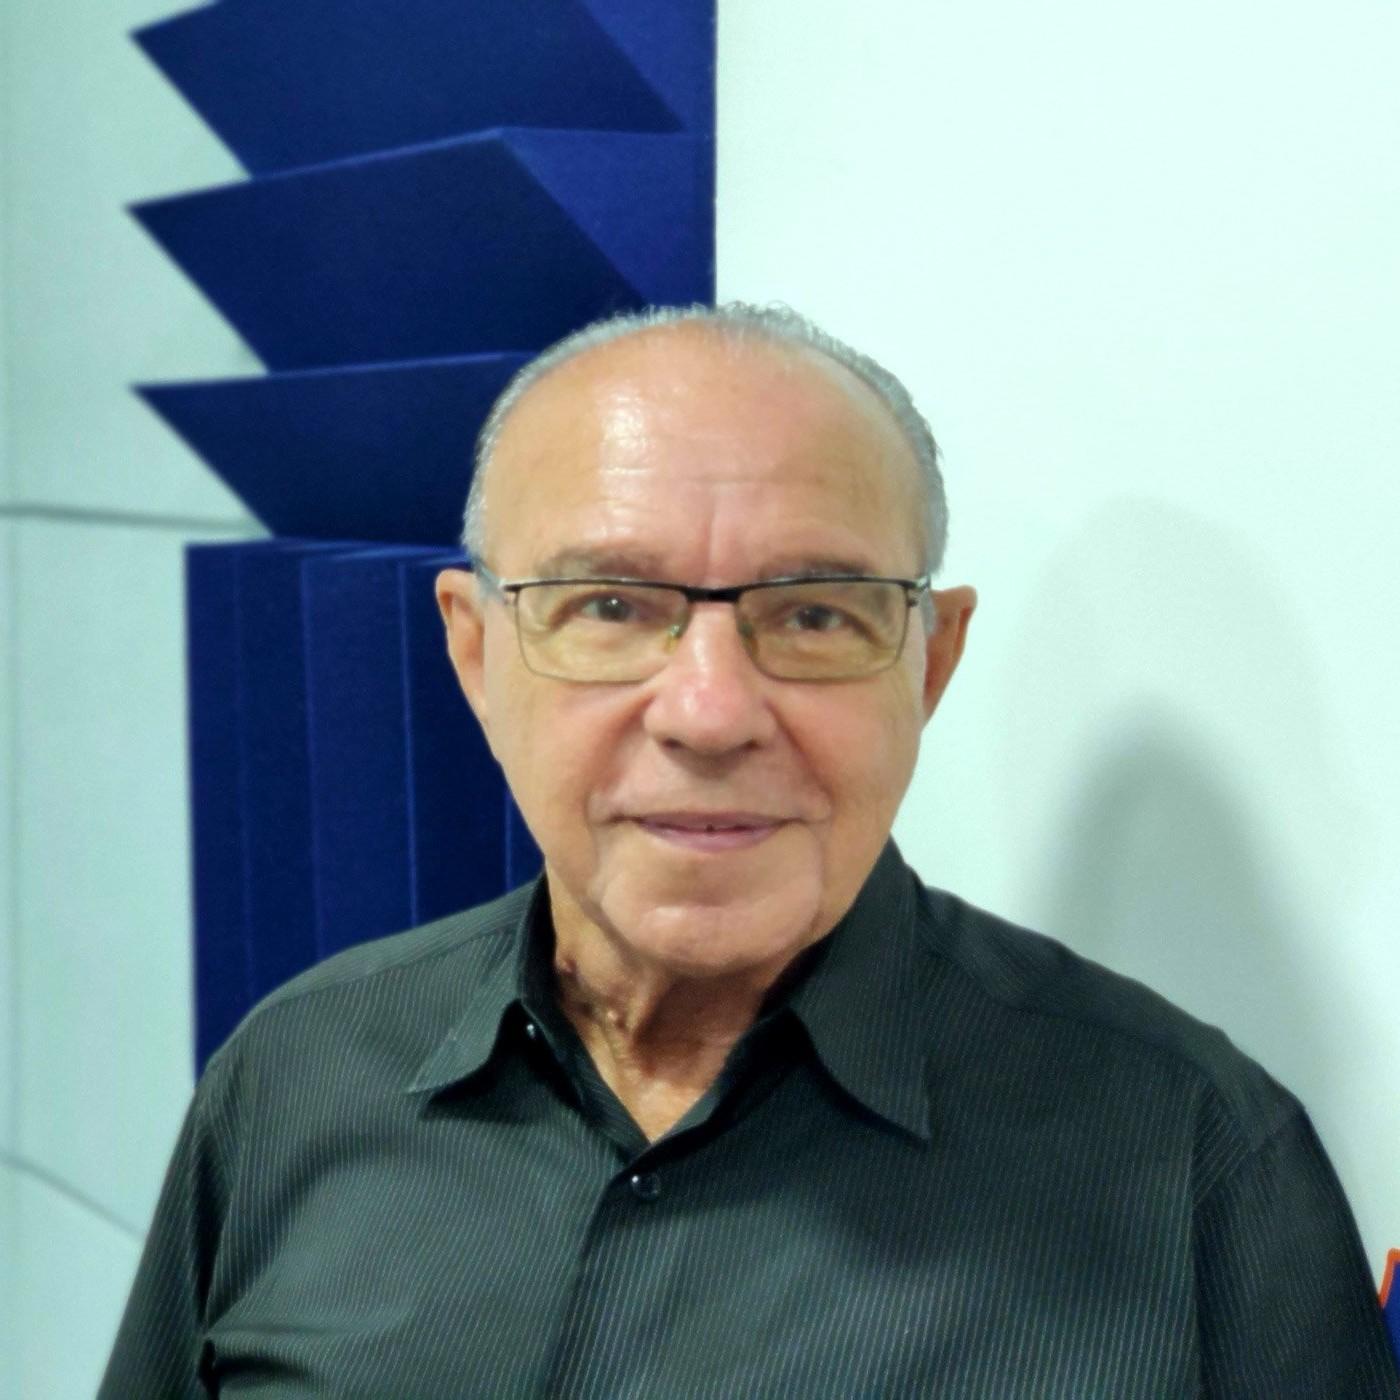 760 - Pensamentos Espíritas com Luiz Carlos Forcato